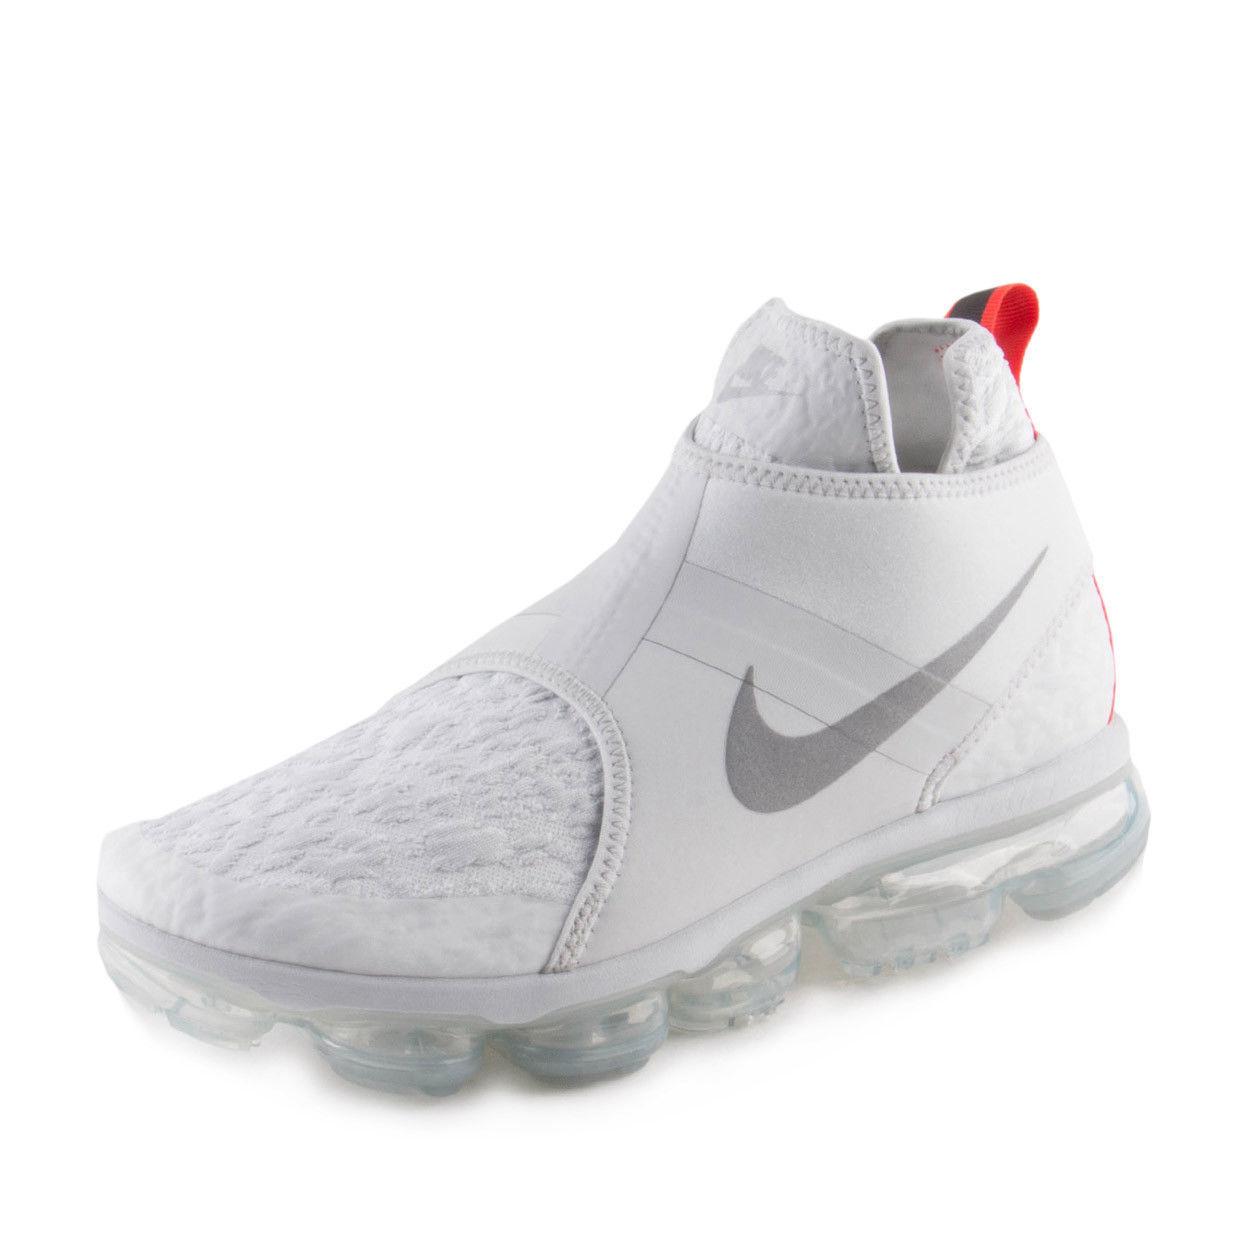 Nike Air Vapormax Chukka Slip size 9.5. White Pure Platinum Silver. AO9326-001.